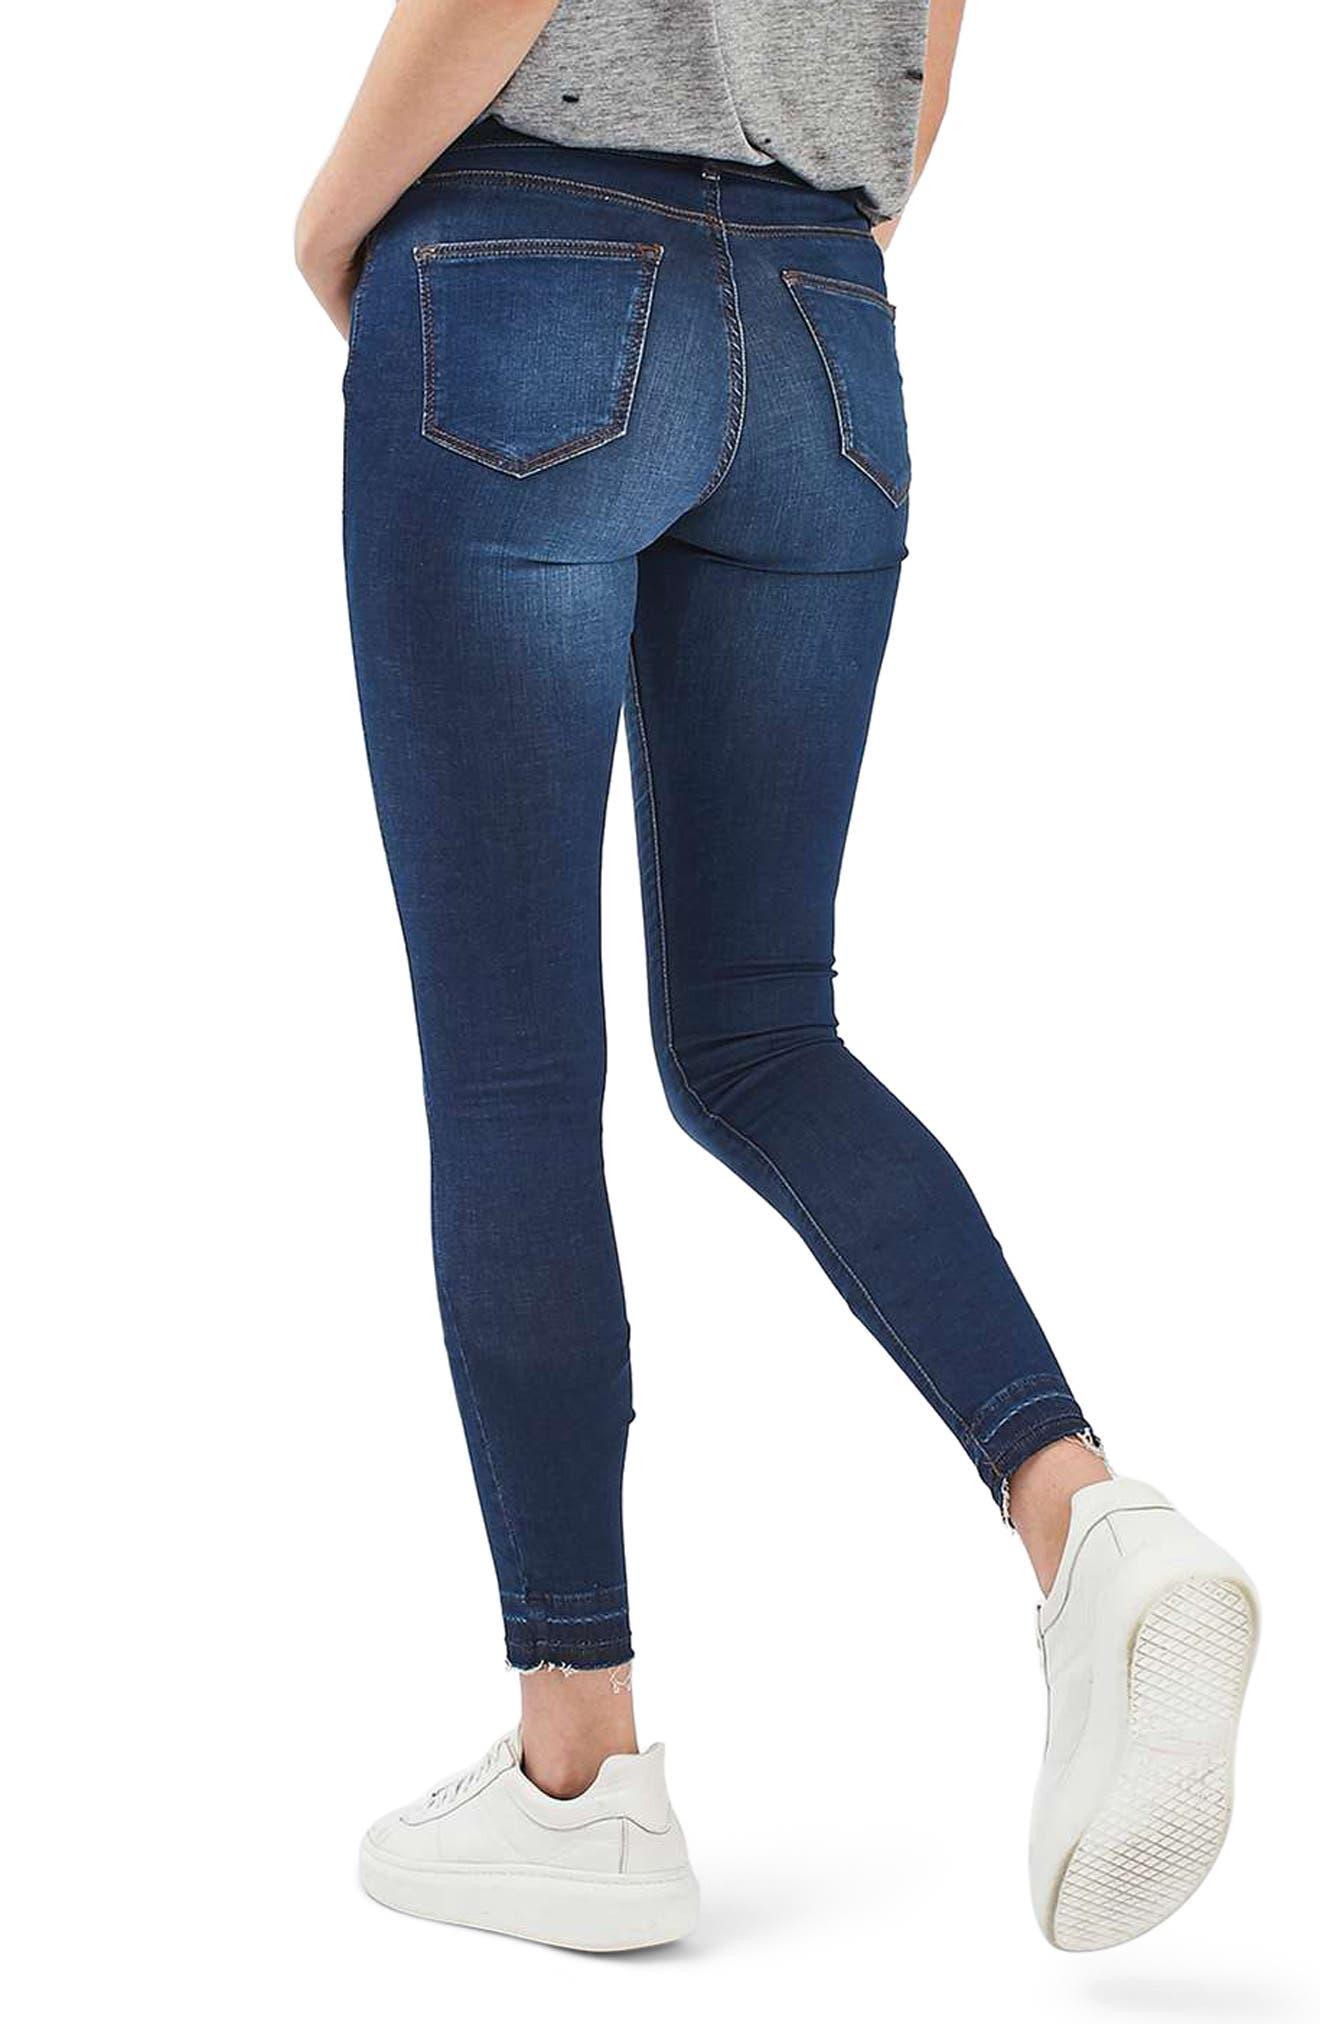 Leigh Release Hem Skinny Jeans,                             Alternate thumbnail 2, color,                             401